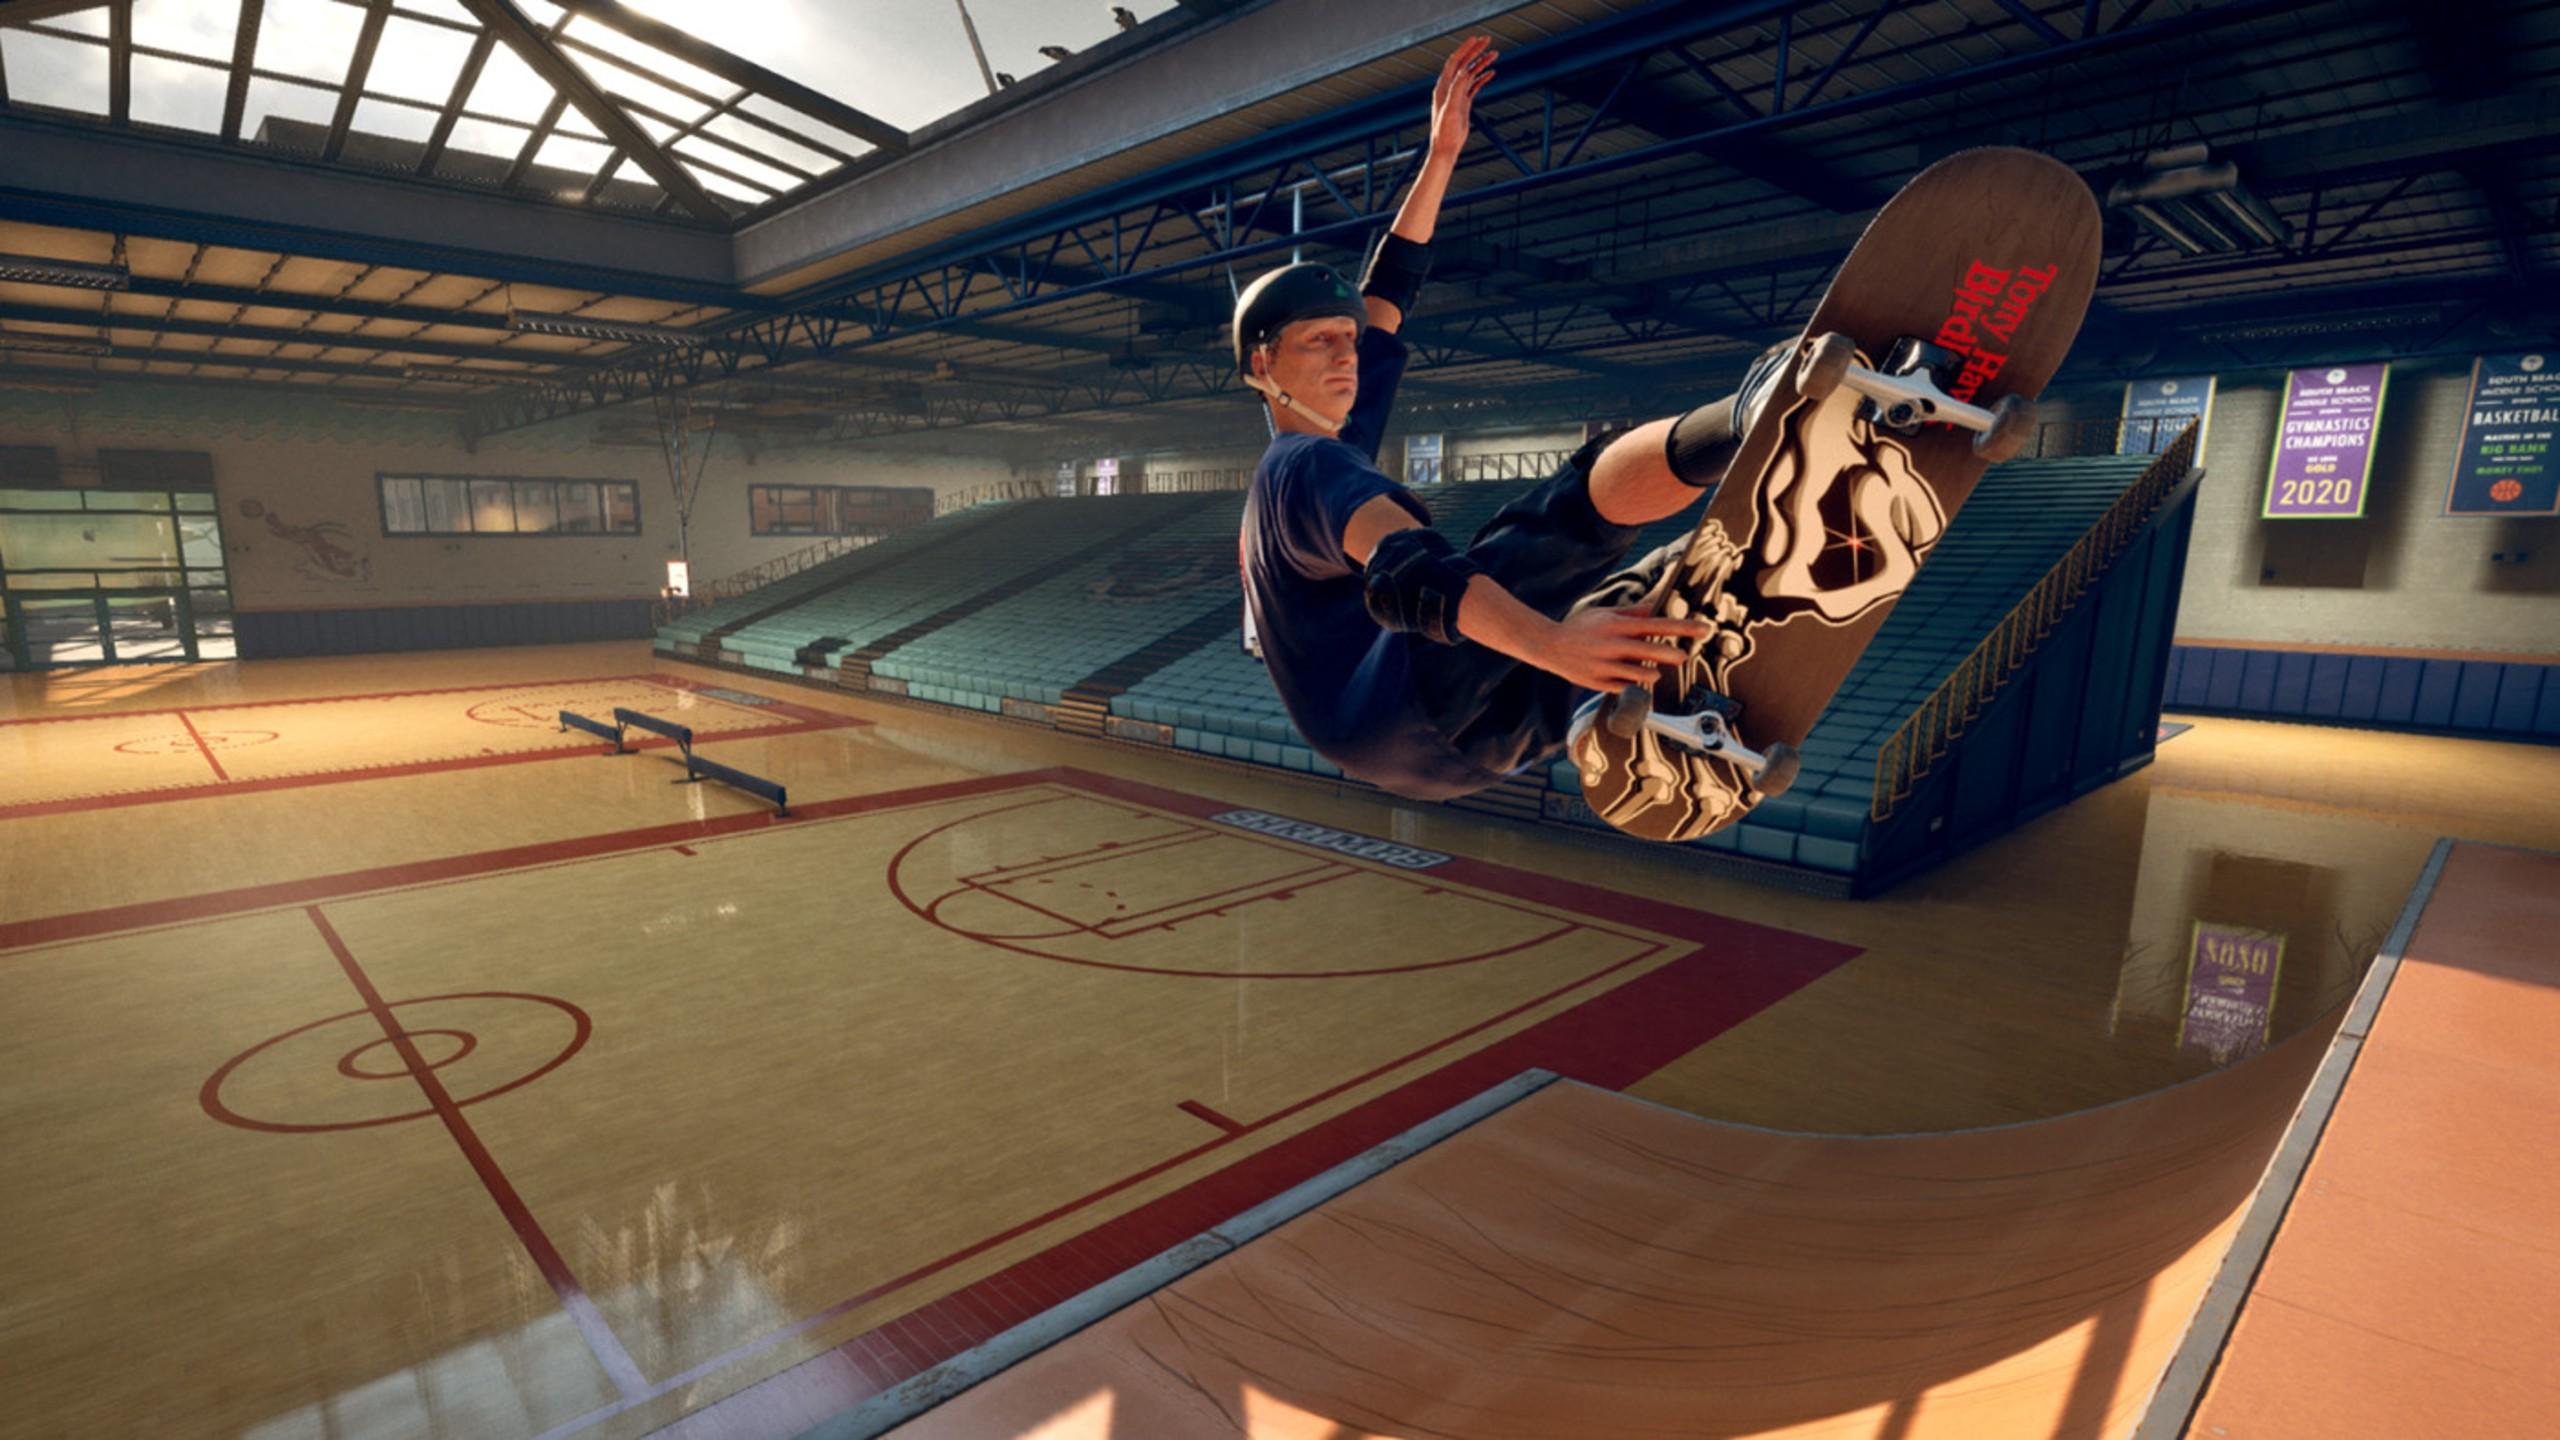 Tony Hawk's Pro Skater 1 & 2 Remake